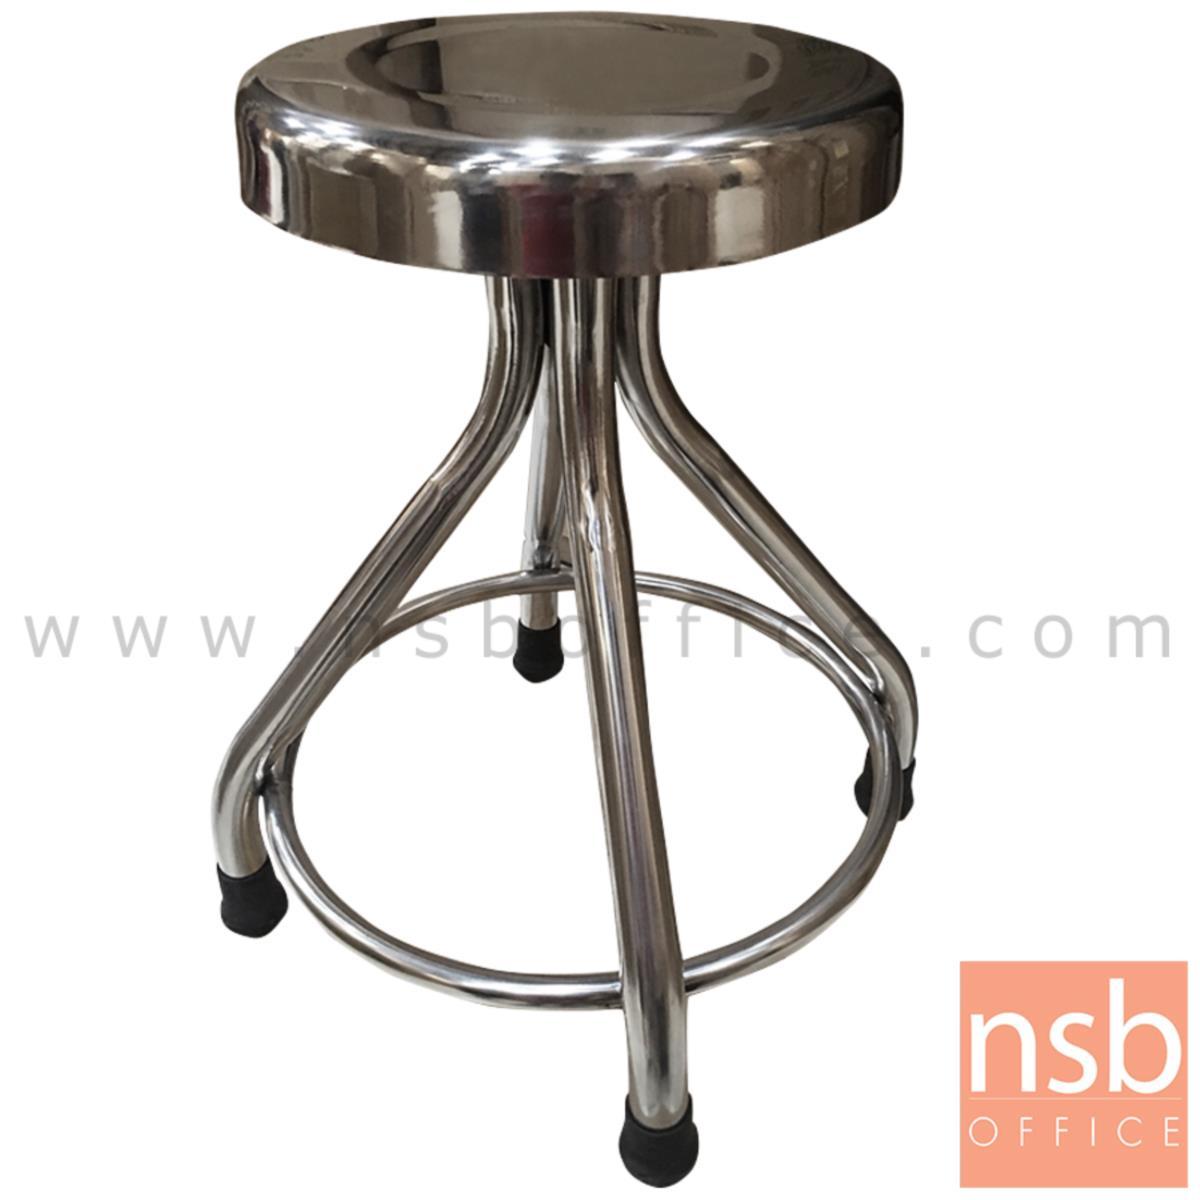 B09A147:เก้าอี้บาร์สตูลที่นั่งกลม รุ่น STLE-1010  สเตนเลสล้วน